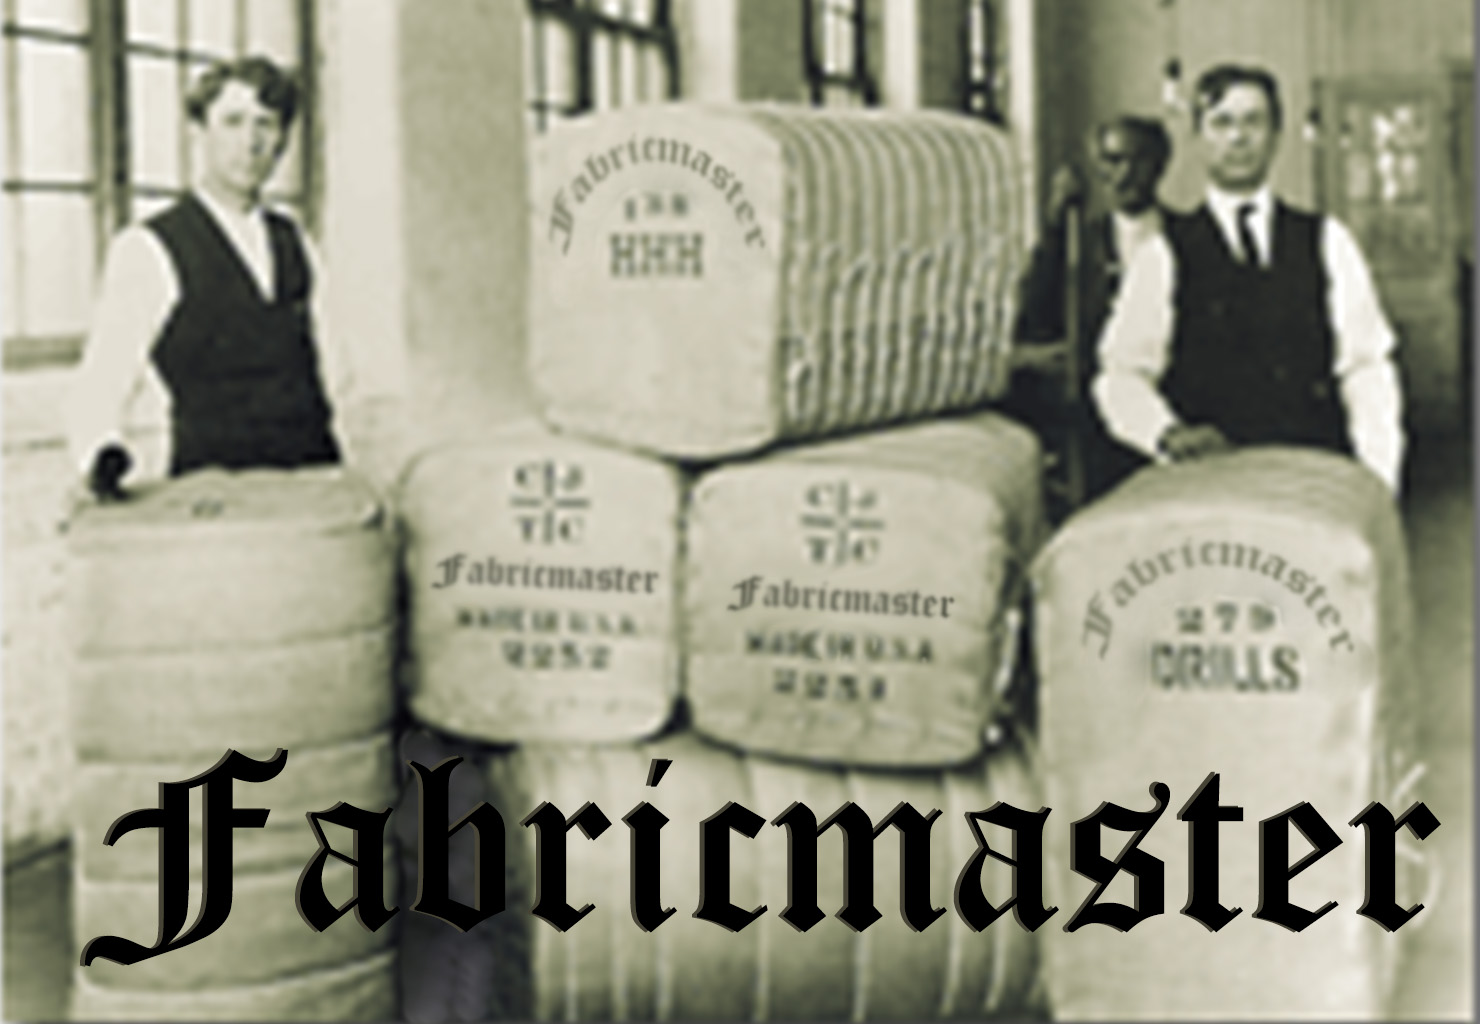 fabricmaster-logo.jpg